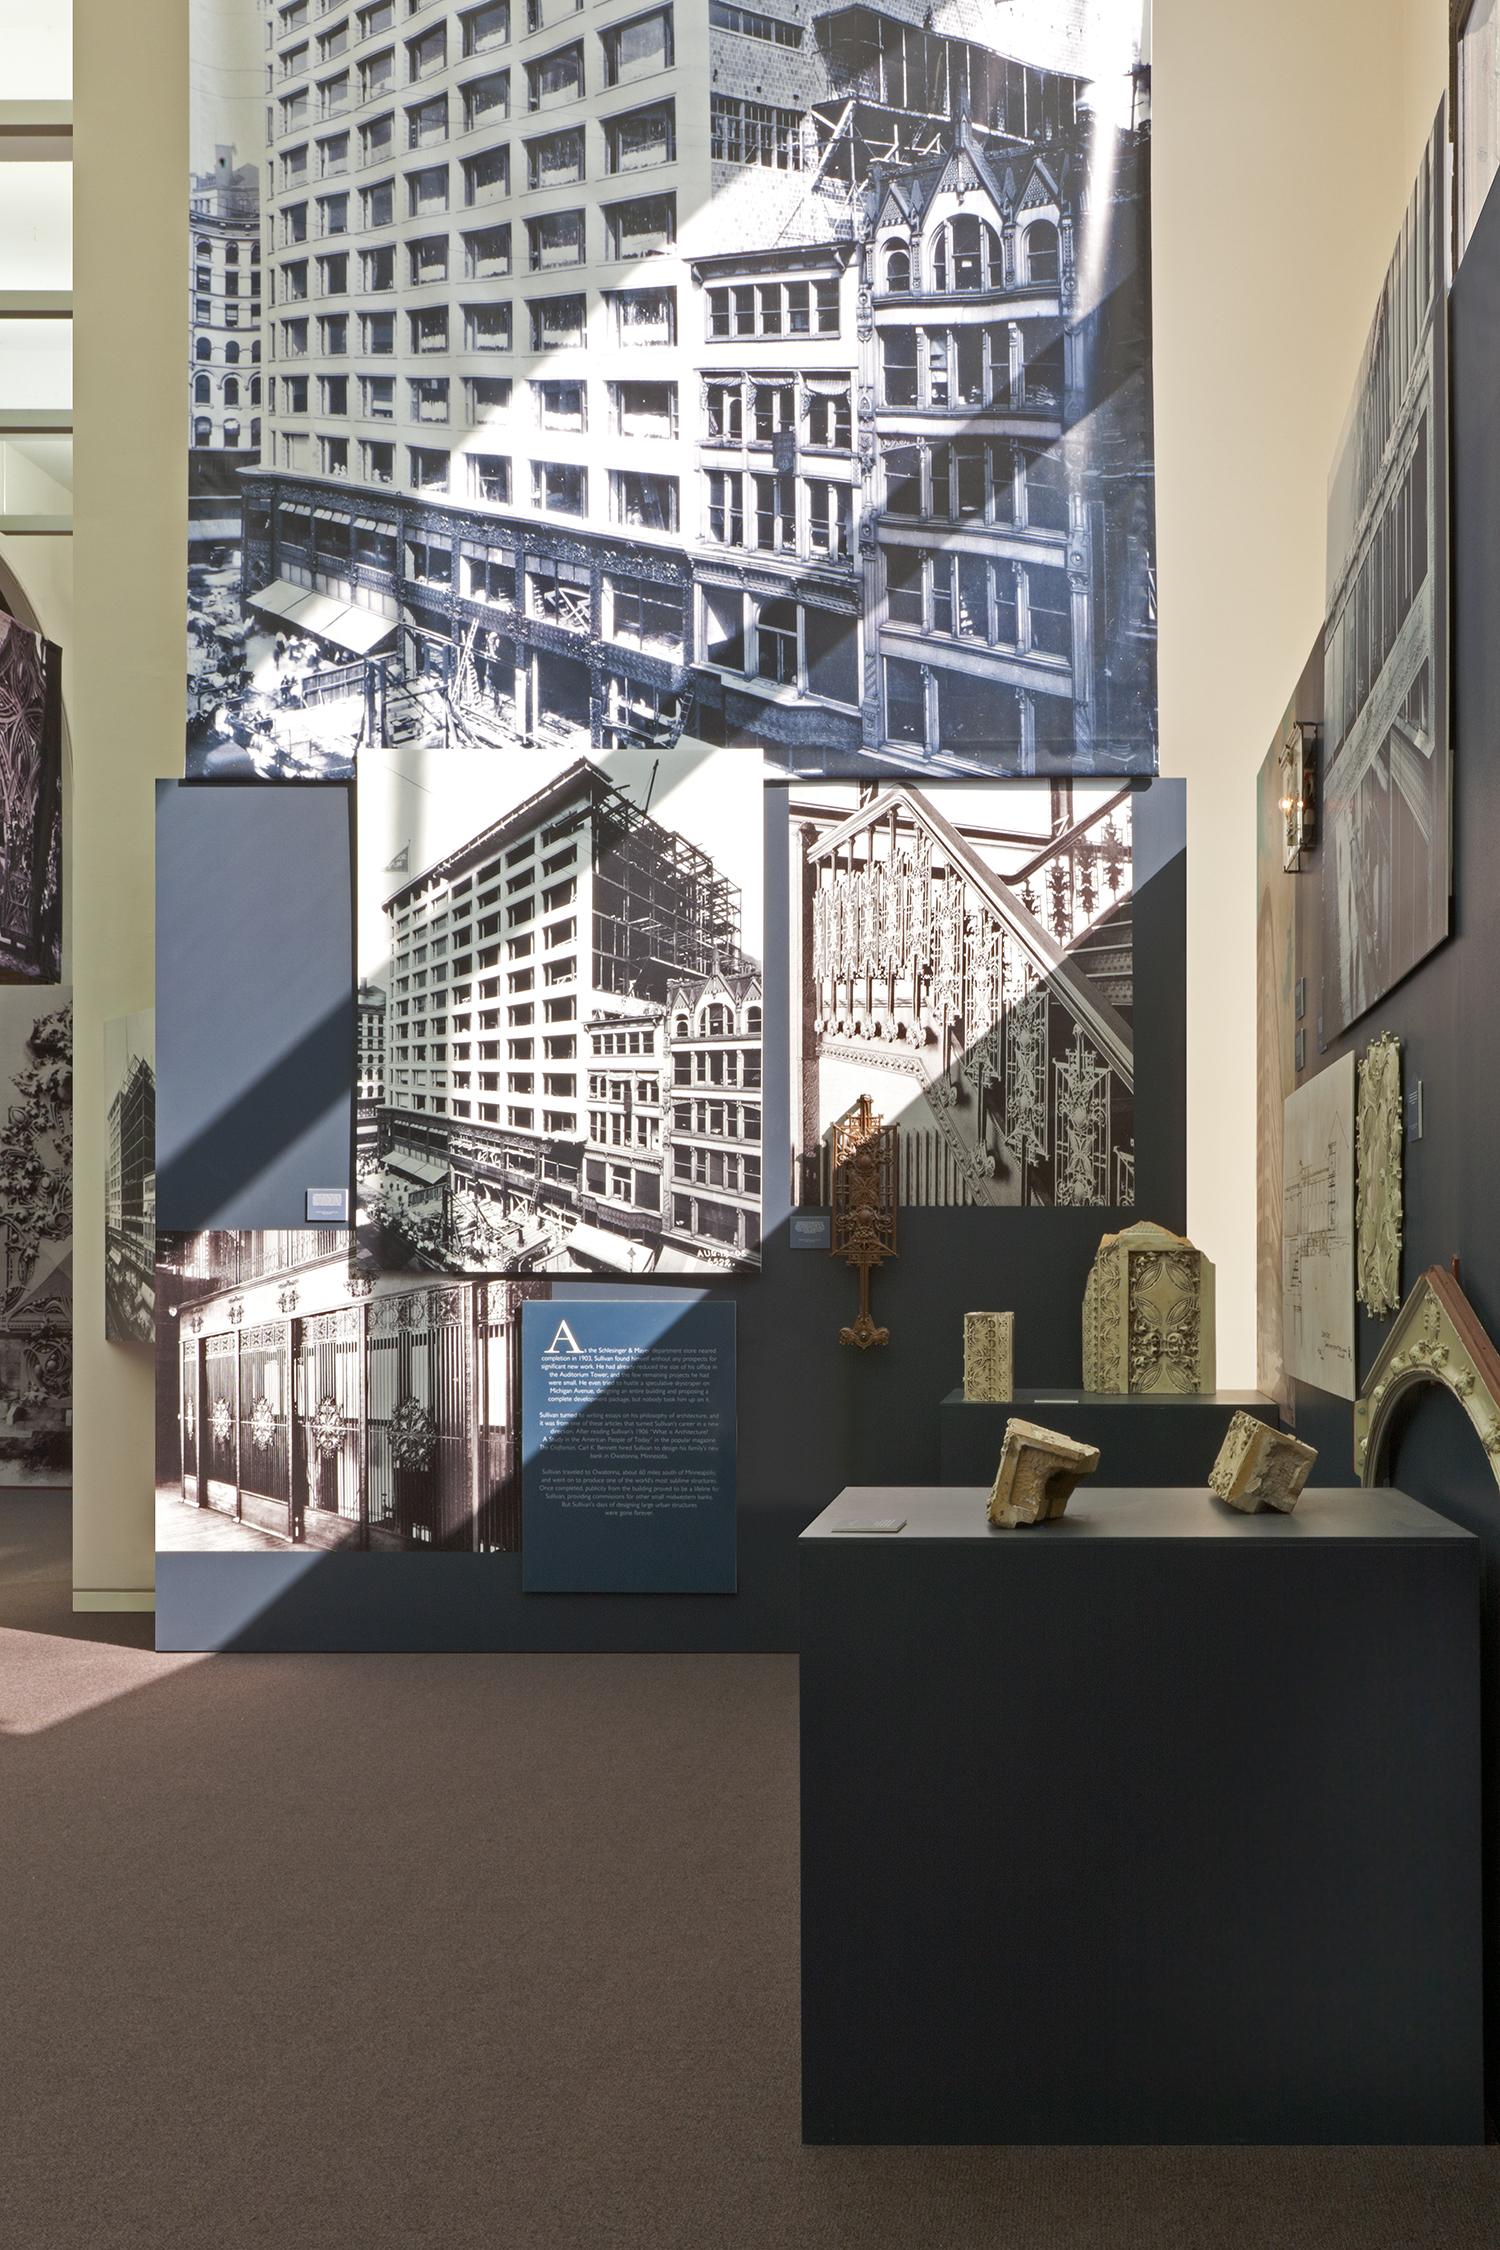 Louis Sullivan's Idea / Chicago Cultural Center / Chicago IL / Curator: Tim Samuelson / 2010